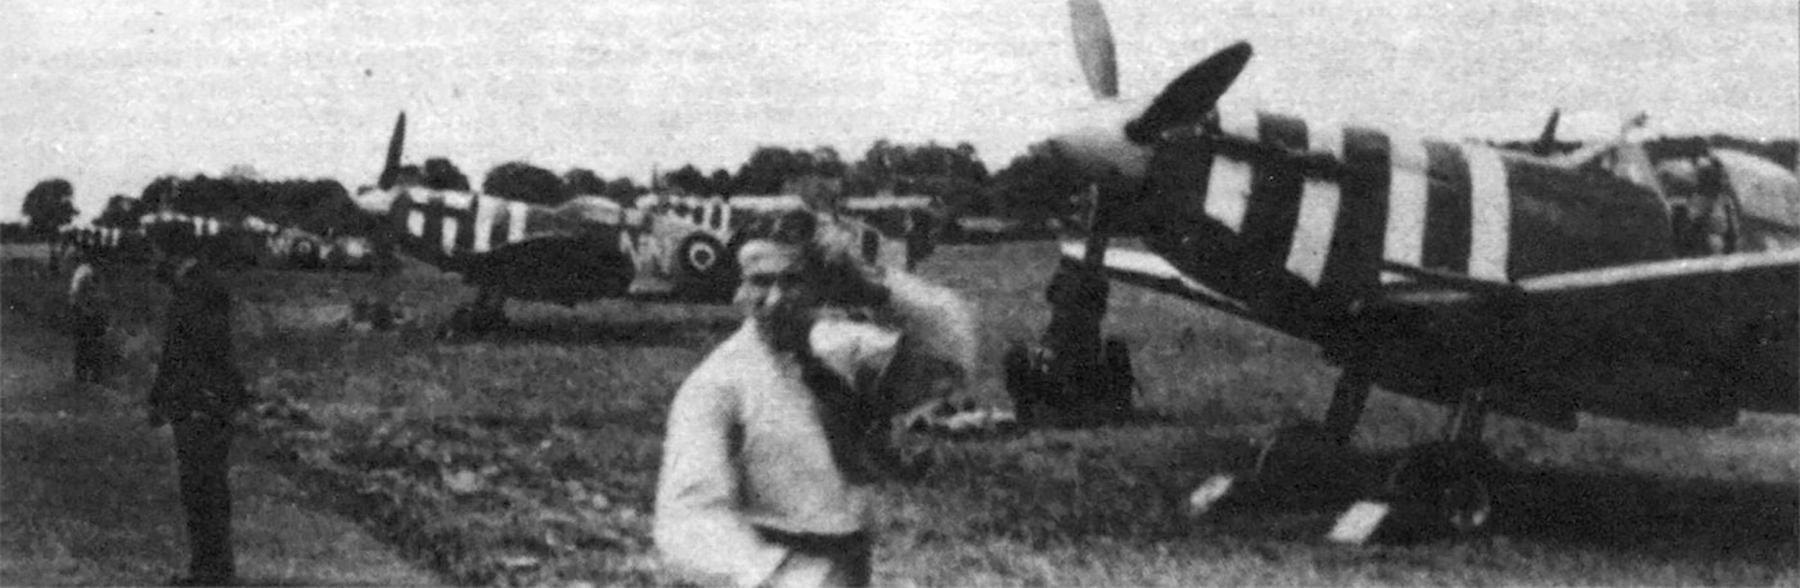 Spitfire MkVb RAF 310Sqn NN during the Dieppe landing England Aug 1942 Military Revue Sep 2013 P15